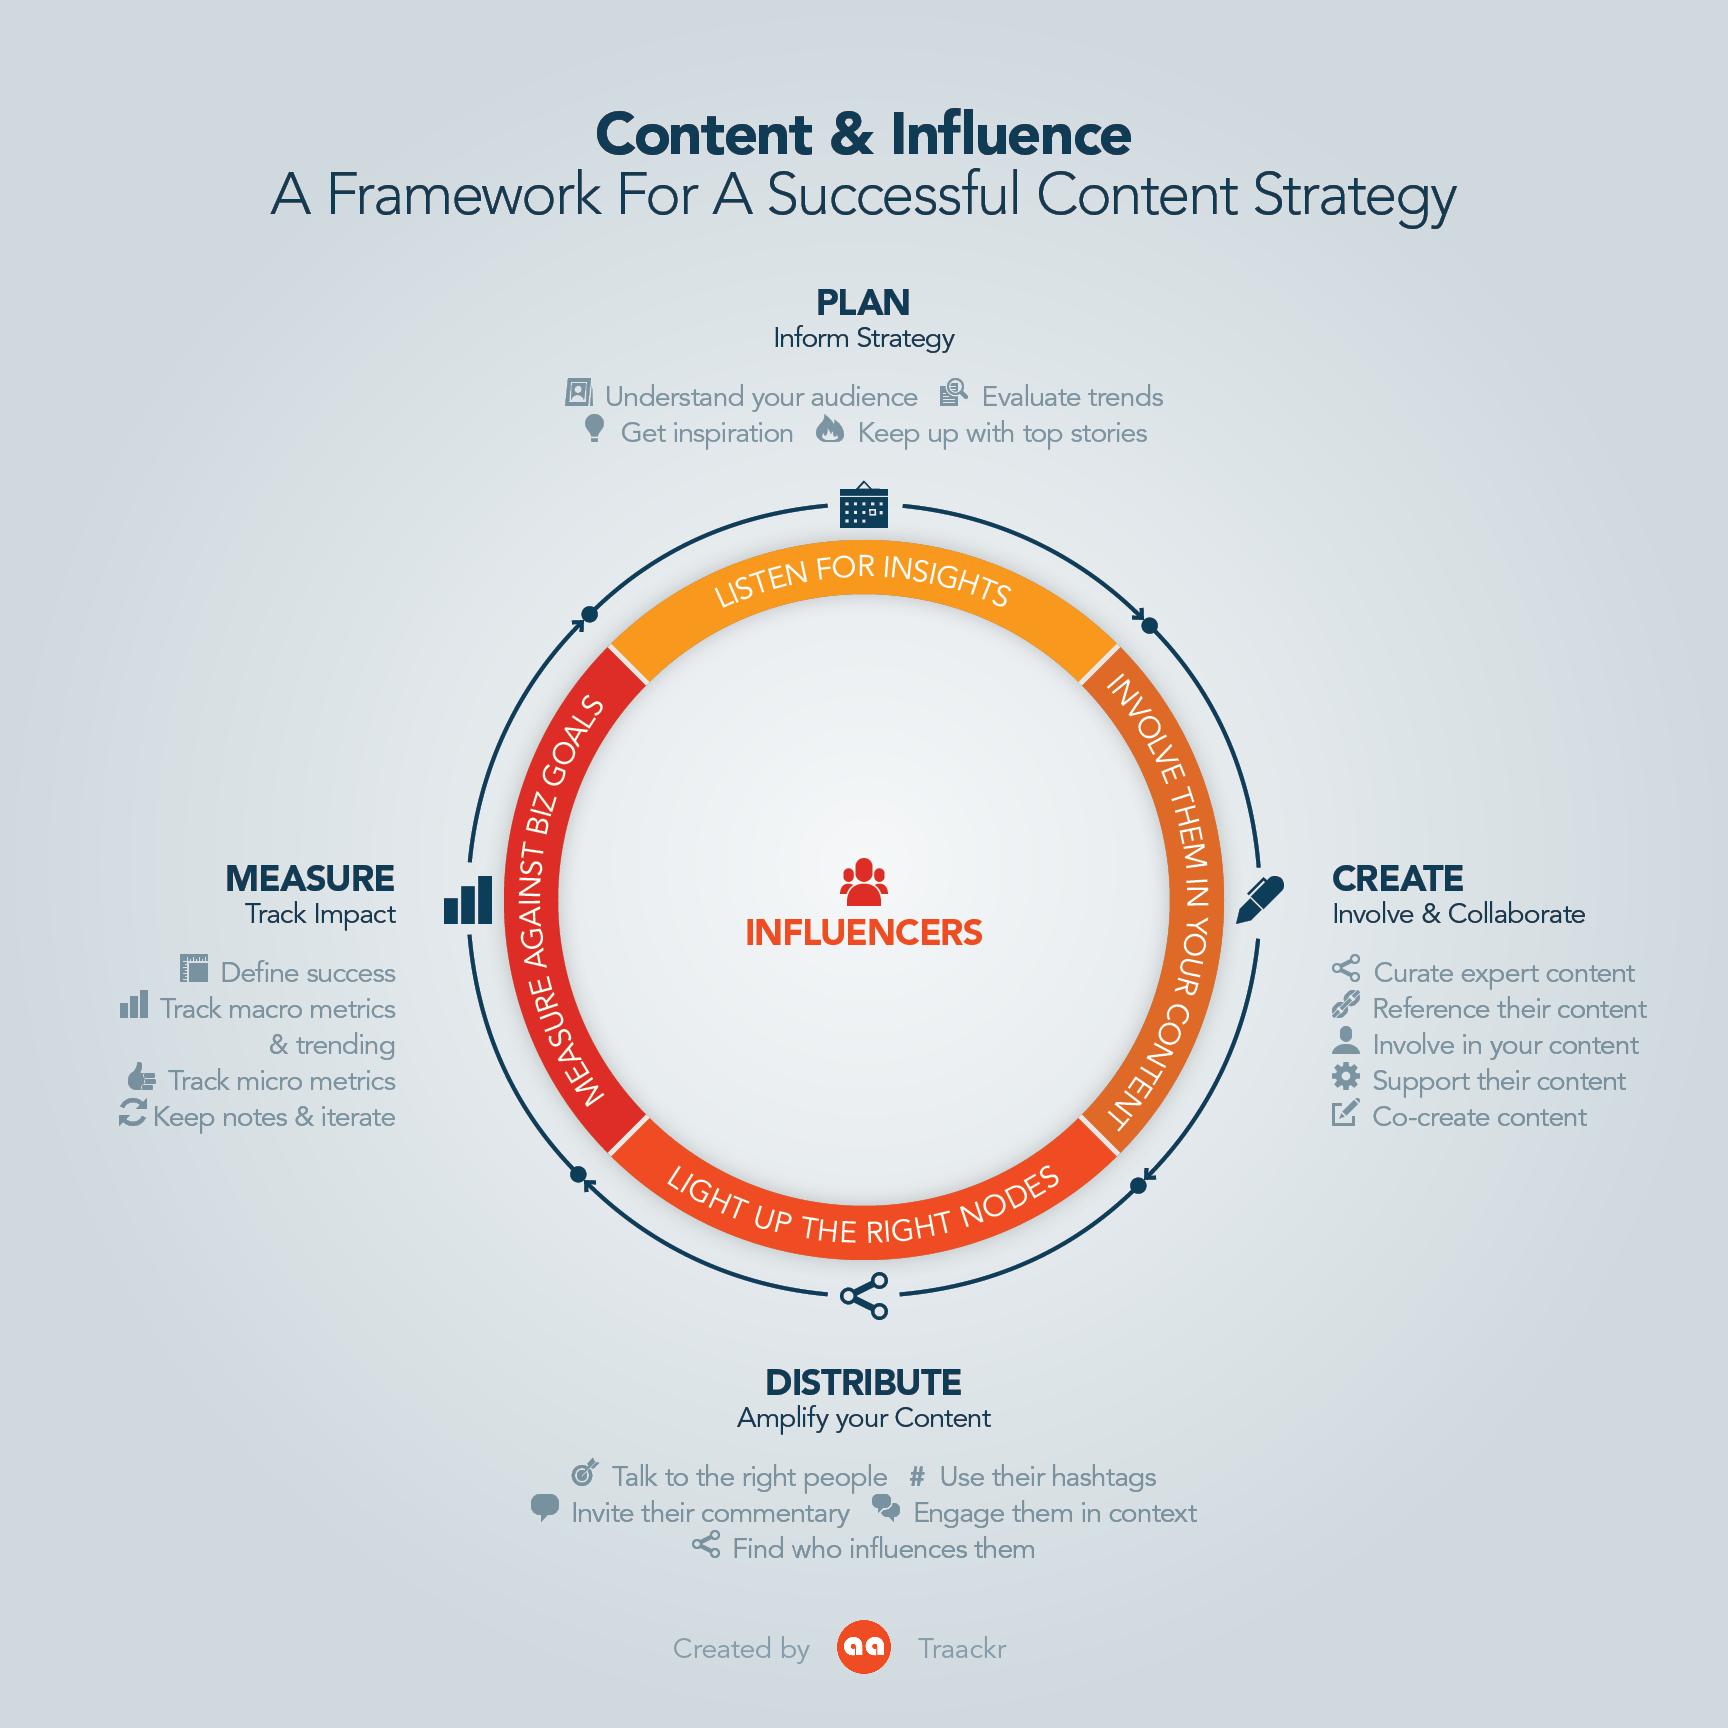 A framework for Content marketing & Influencer strategy